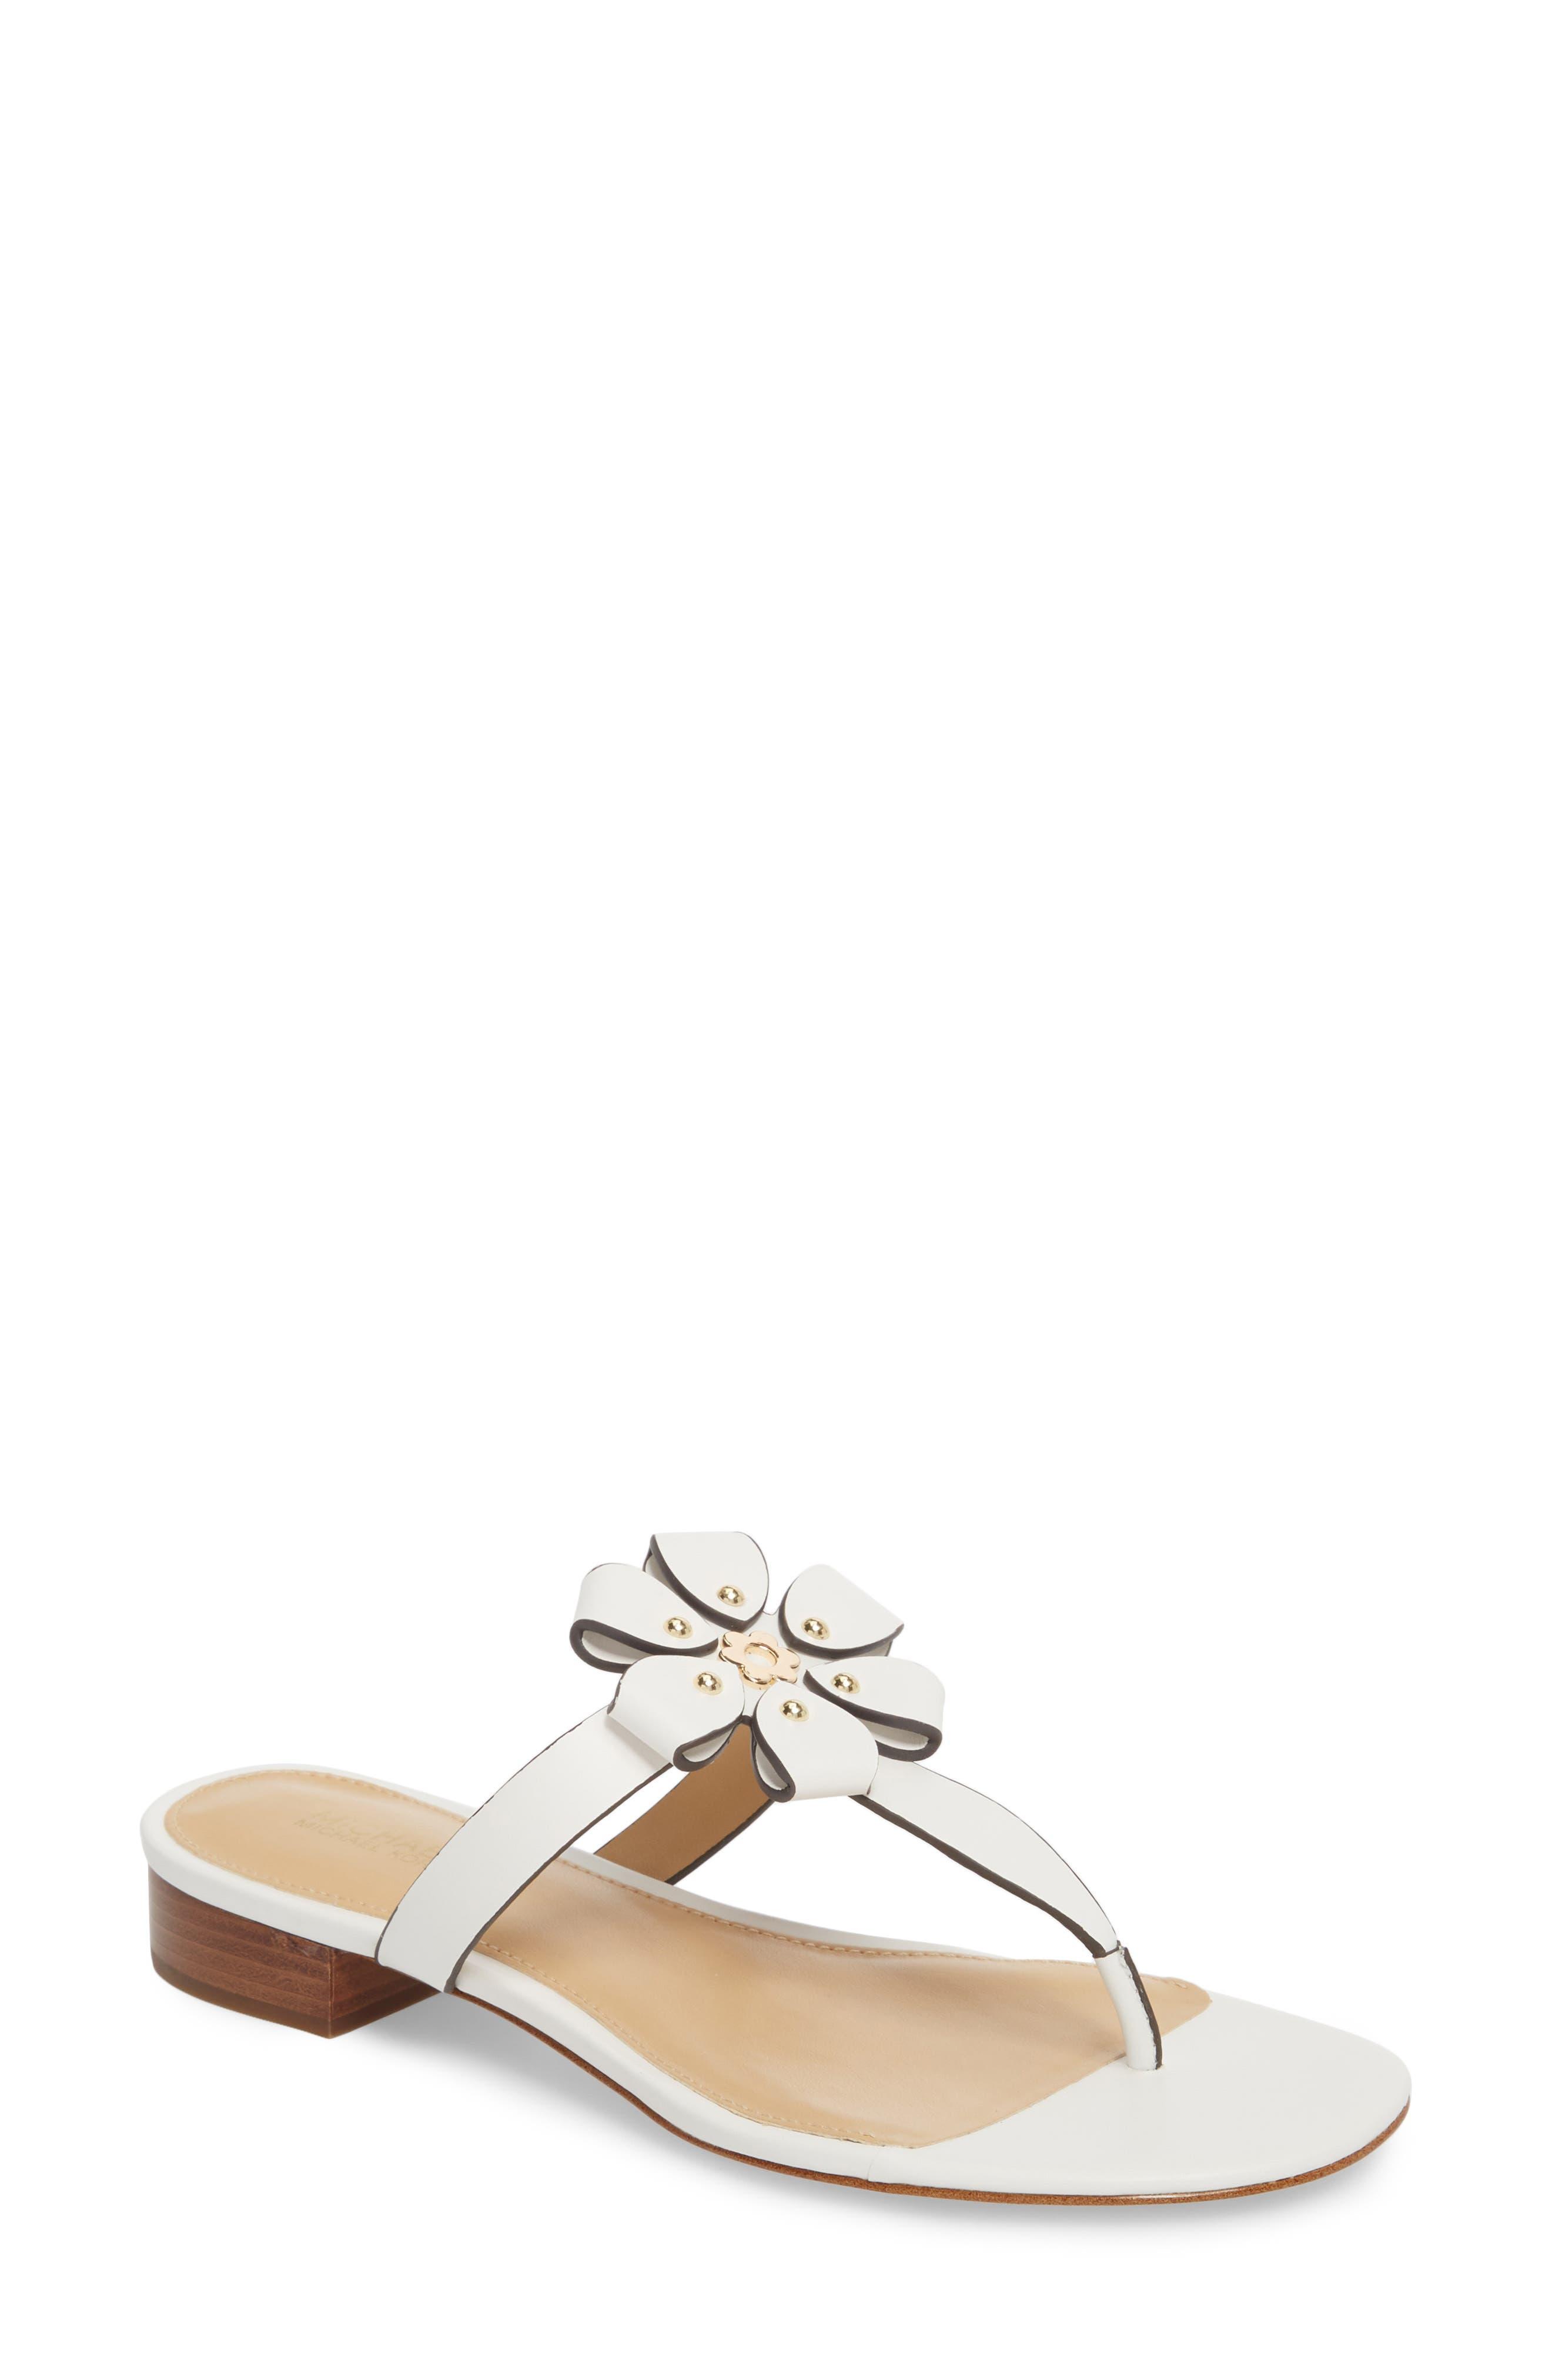 Tara Flip Flop,                             Main thumbnail 1, color,                             Optic White Leather